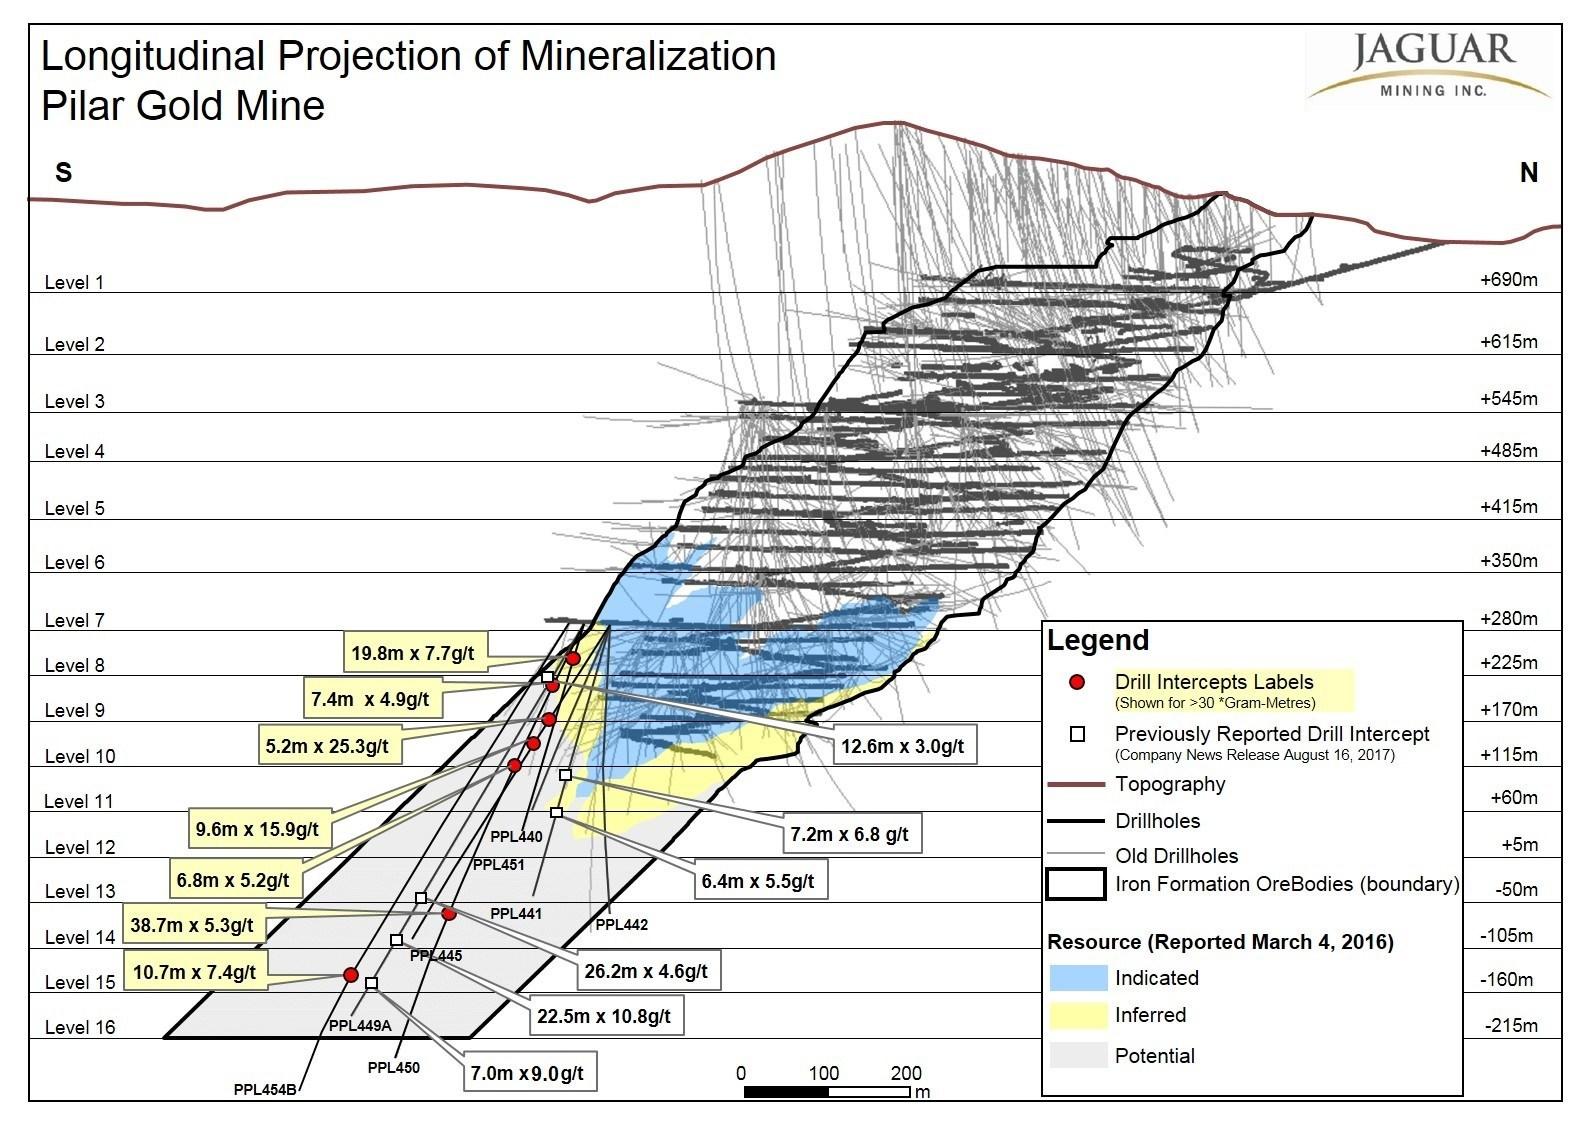 Longitudinal Projection of Mineralization Pilar Gold Mine (CNW Group/Jaguar Mining Inc.)